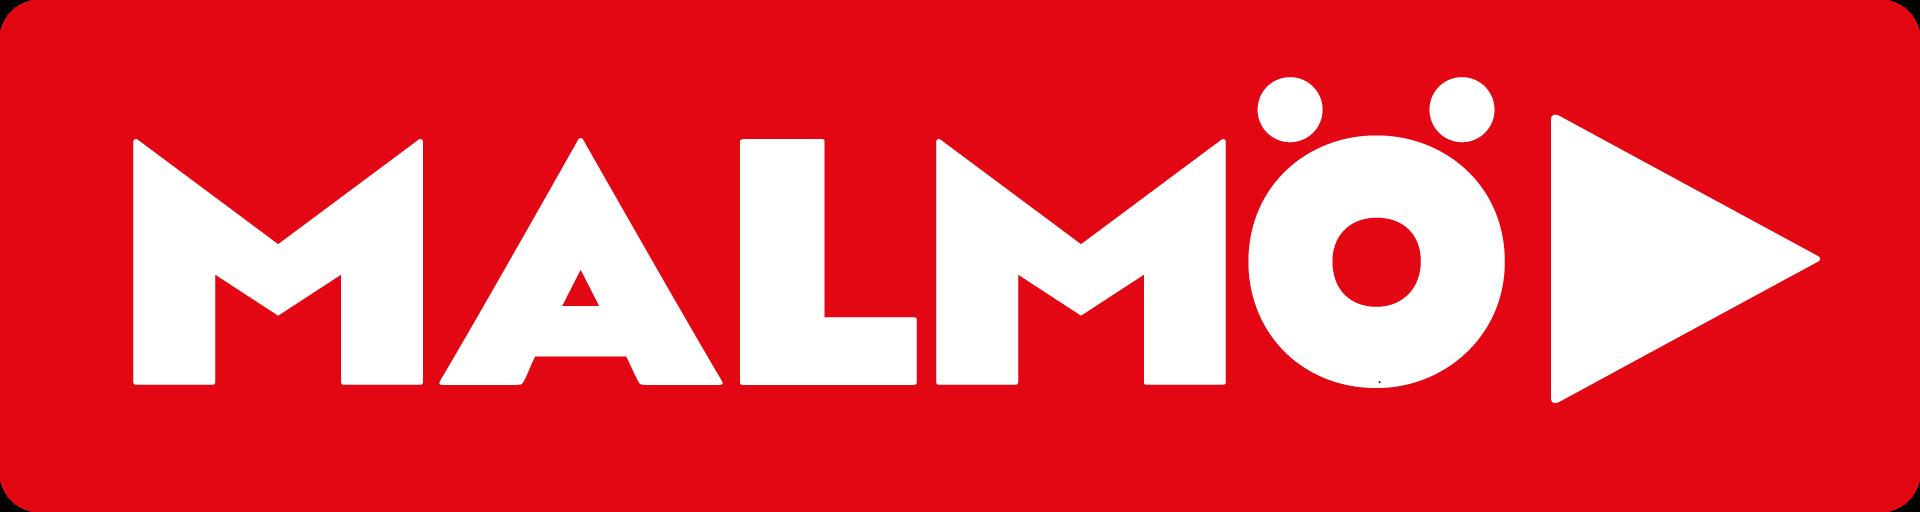 Malmö Turism